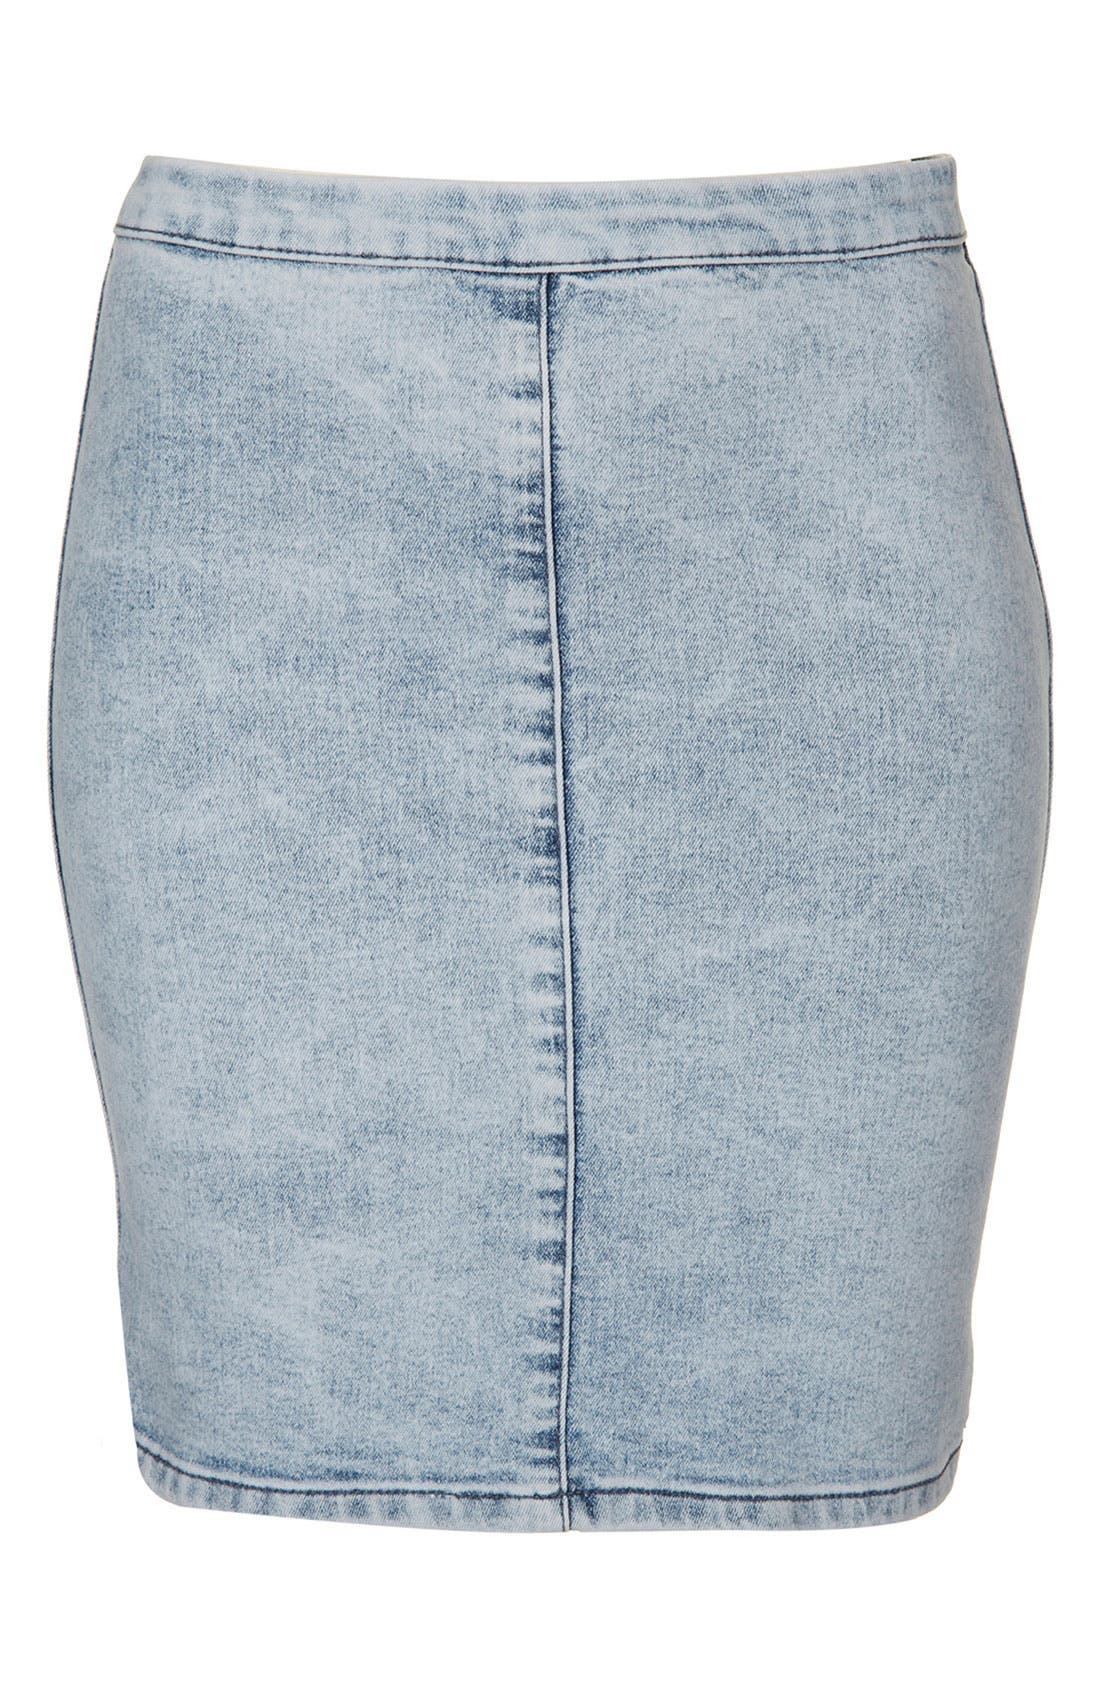 Main Image - Topshop Moto 'Joni' Denim Skirt